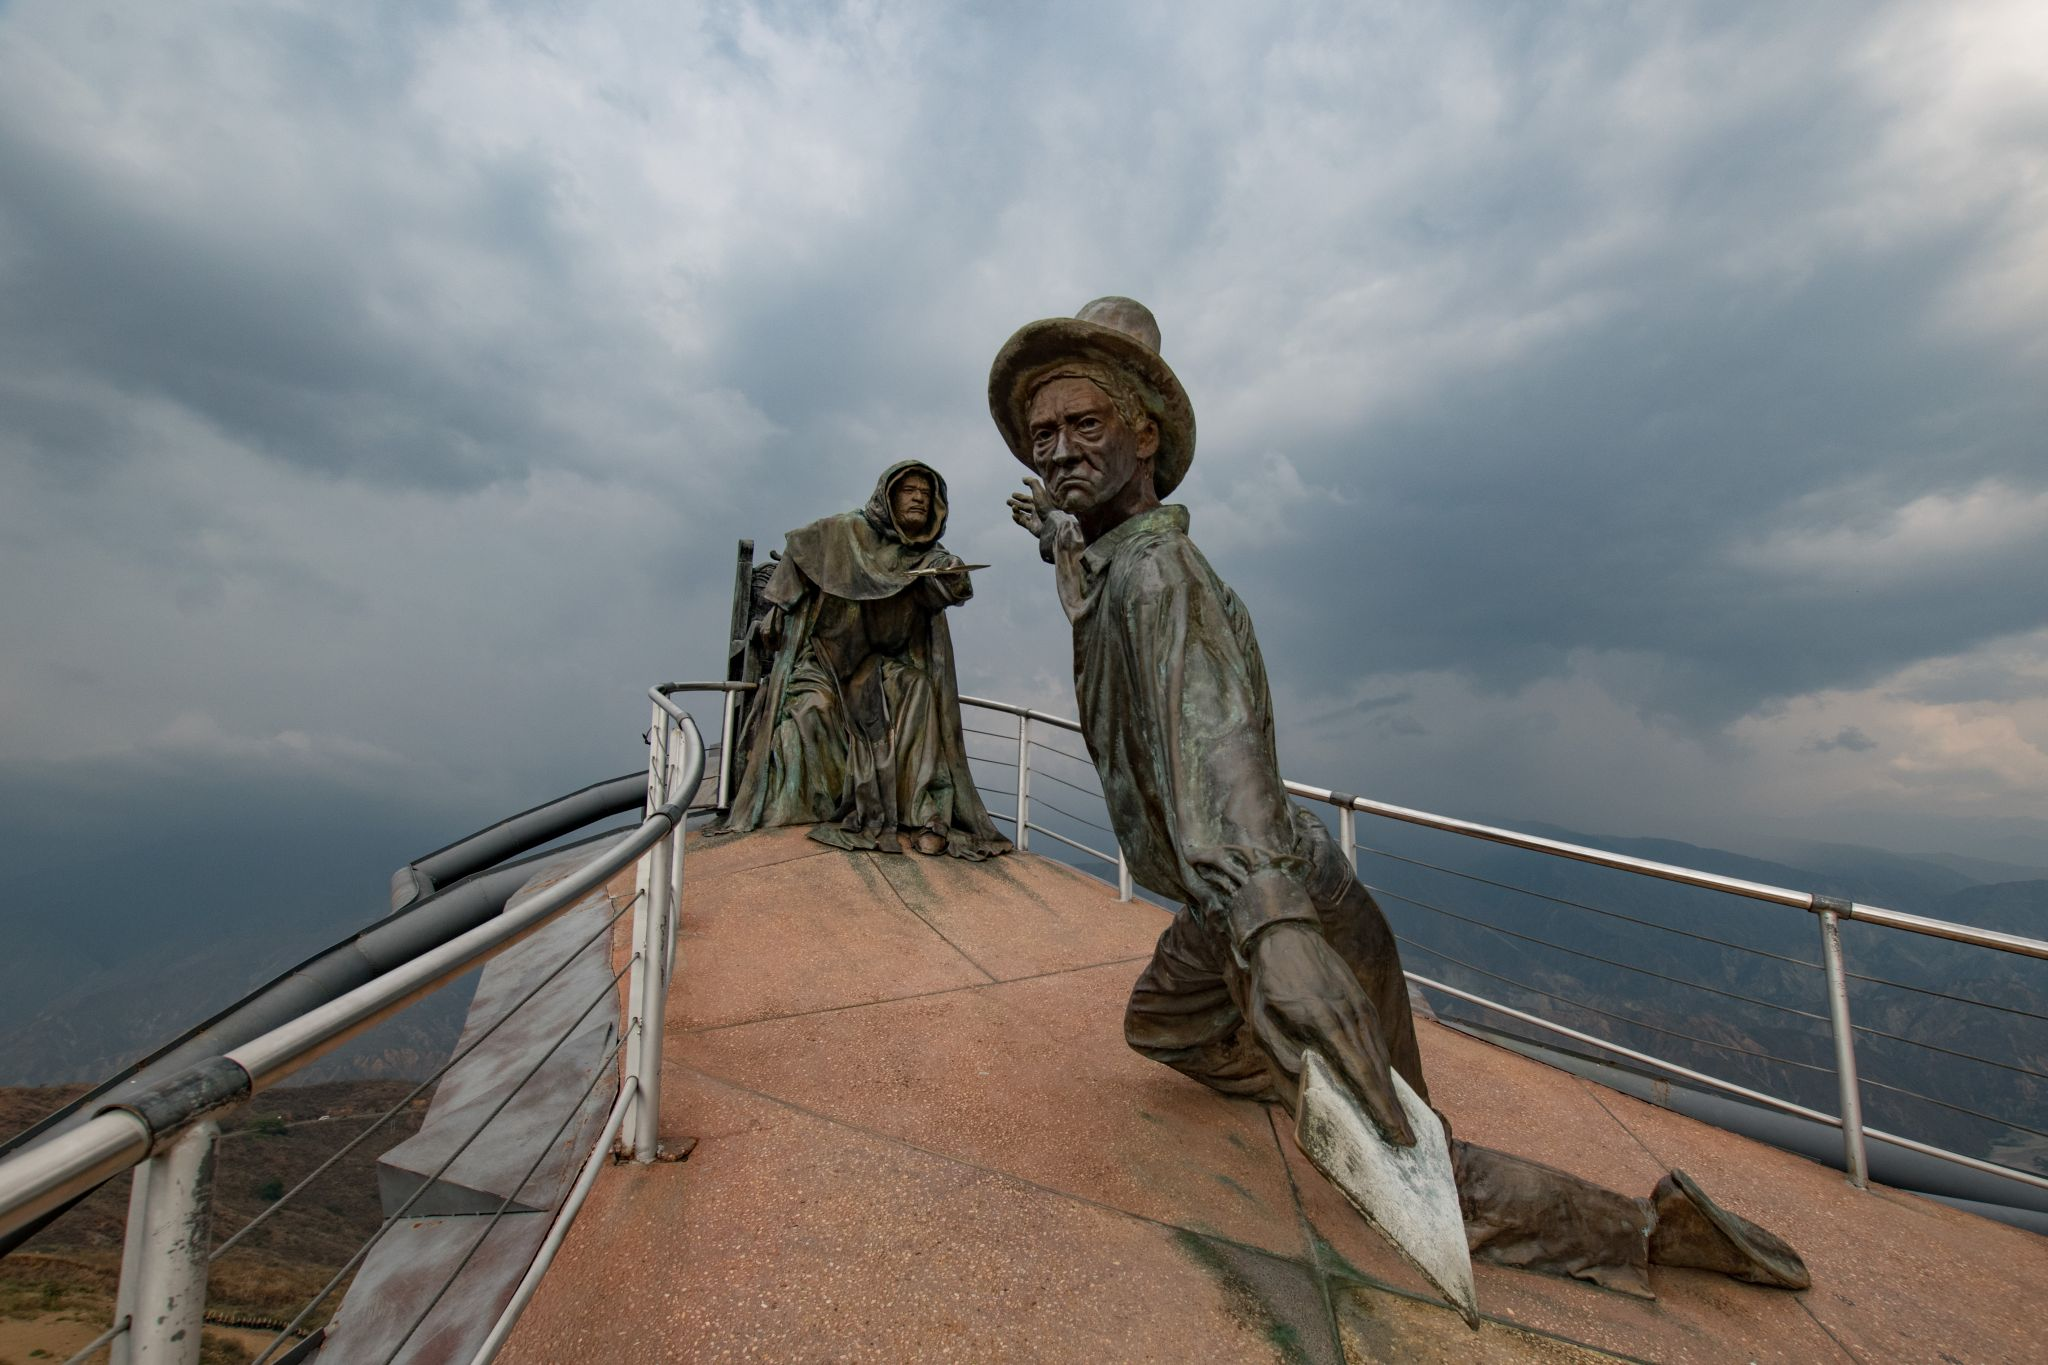 Parque Nacional del Chicamocha - Peasants' Revolt Monument, Colombia